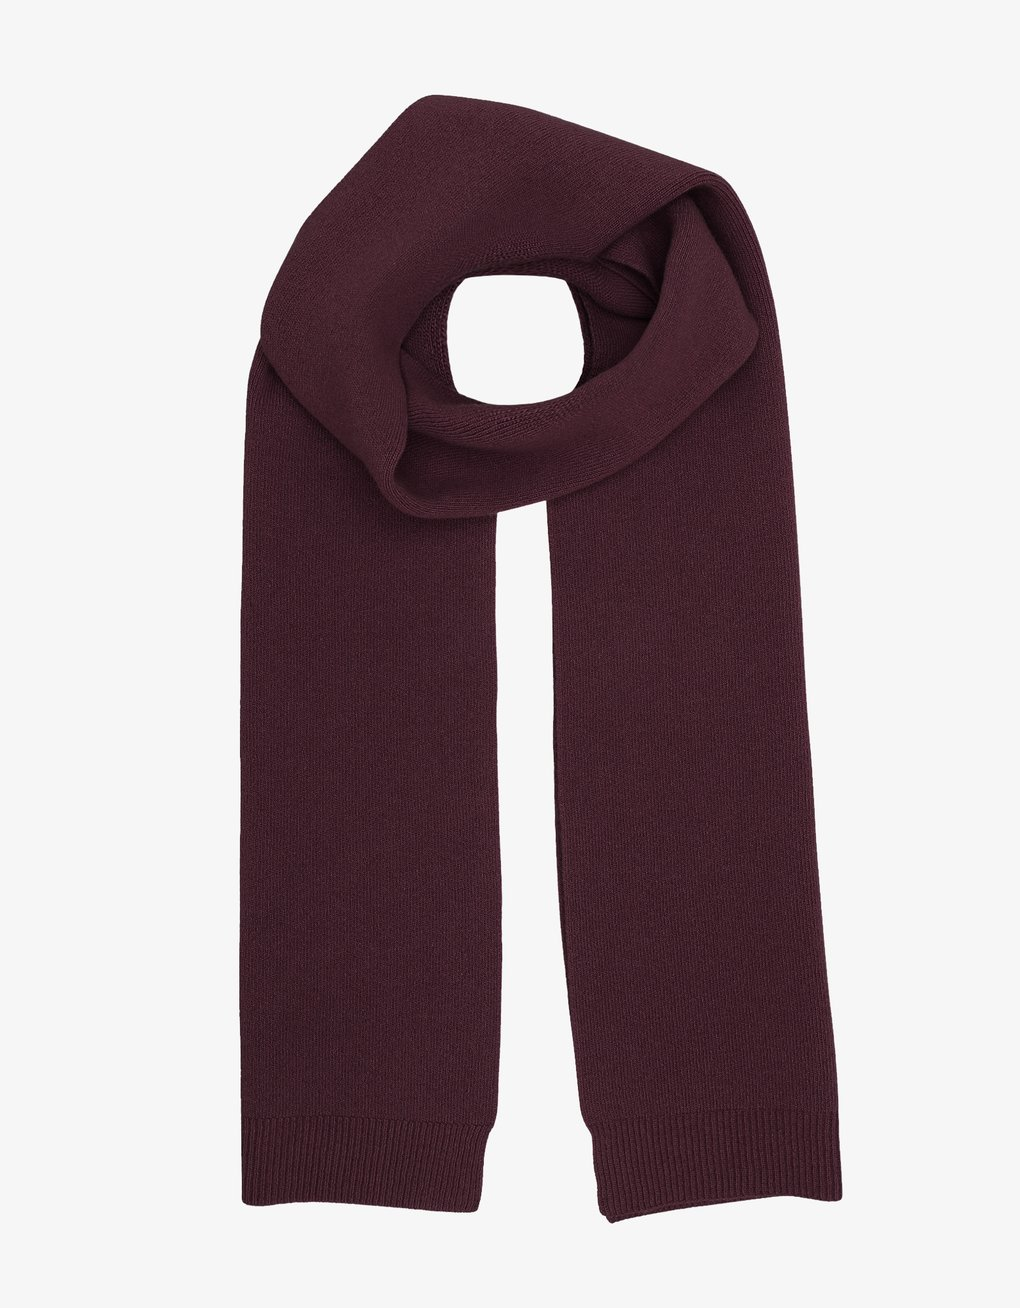 Merino wool scarf – Oxblood red